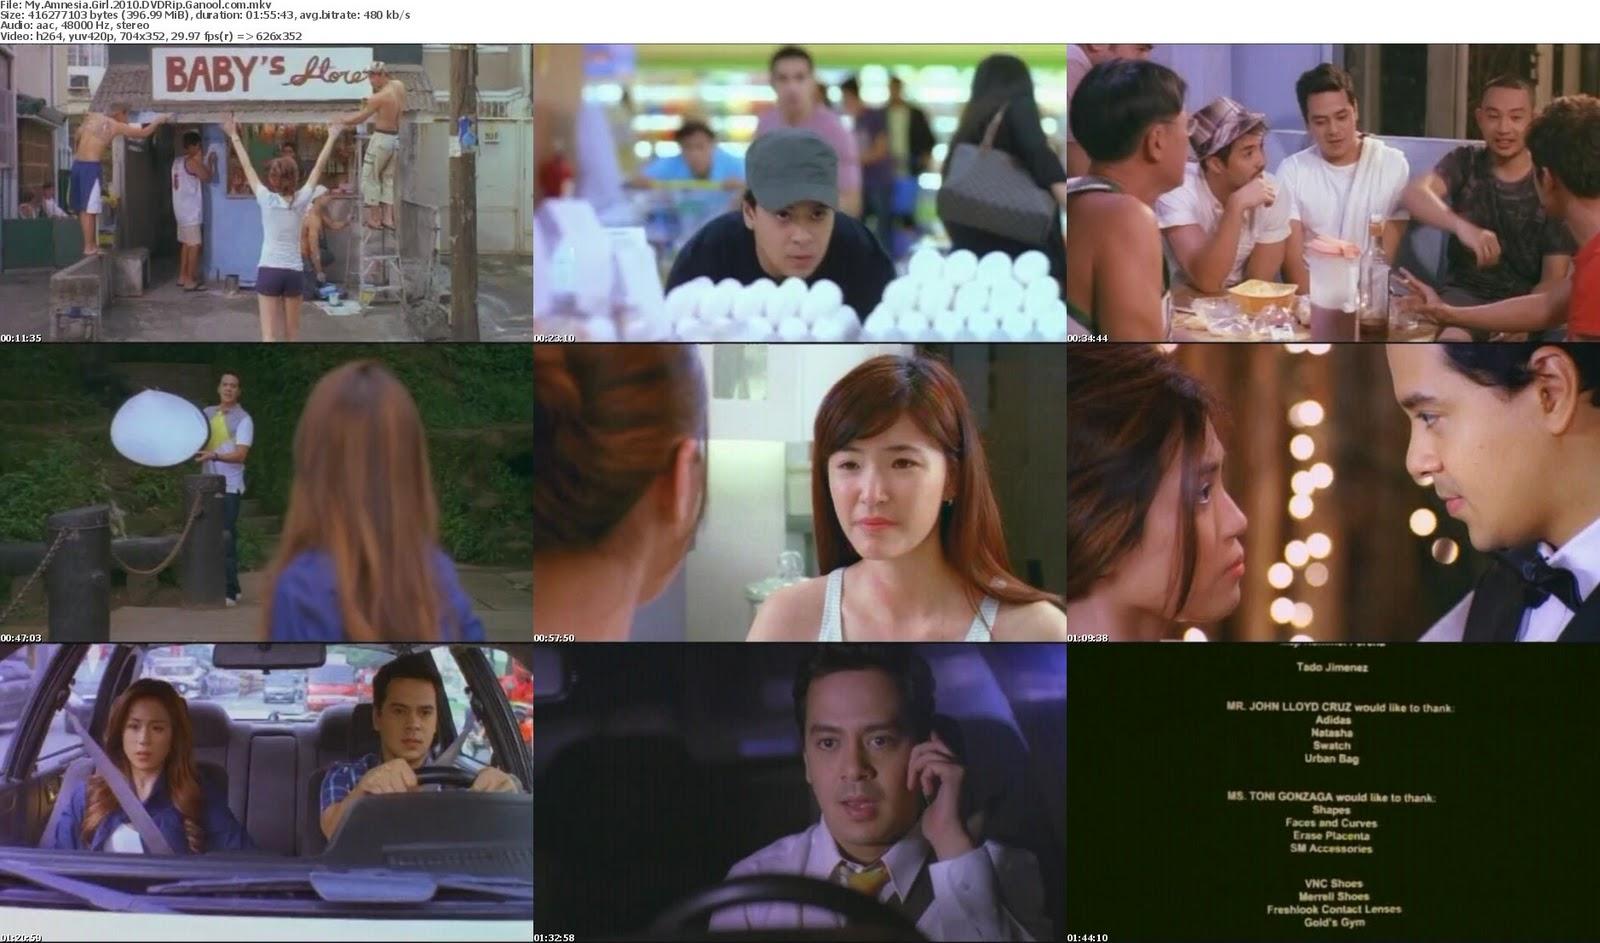 http://2.bp.blogspot.com/_RvtUEY2b-mI/TSFbjor9CBI/AAAAAAAAC2Y/-M0vyl8g4Uw/s1600/My+Amnesia+Girl+%25282010%2529+Screen.jpg